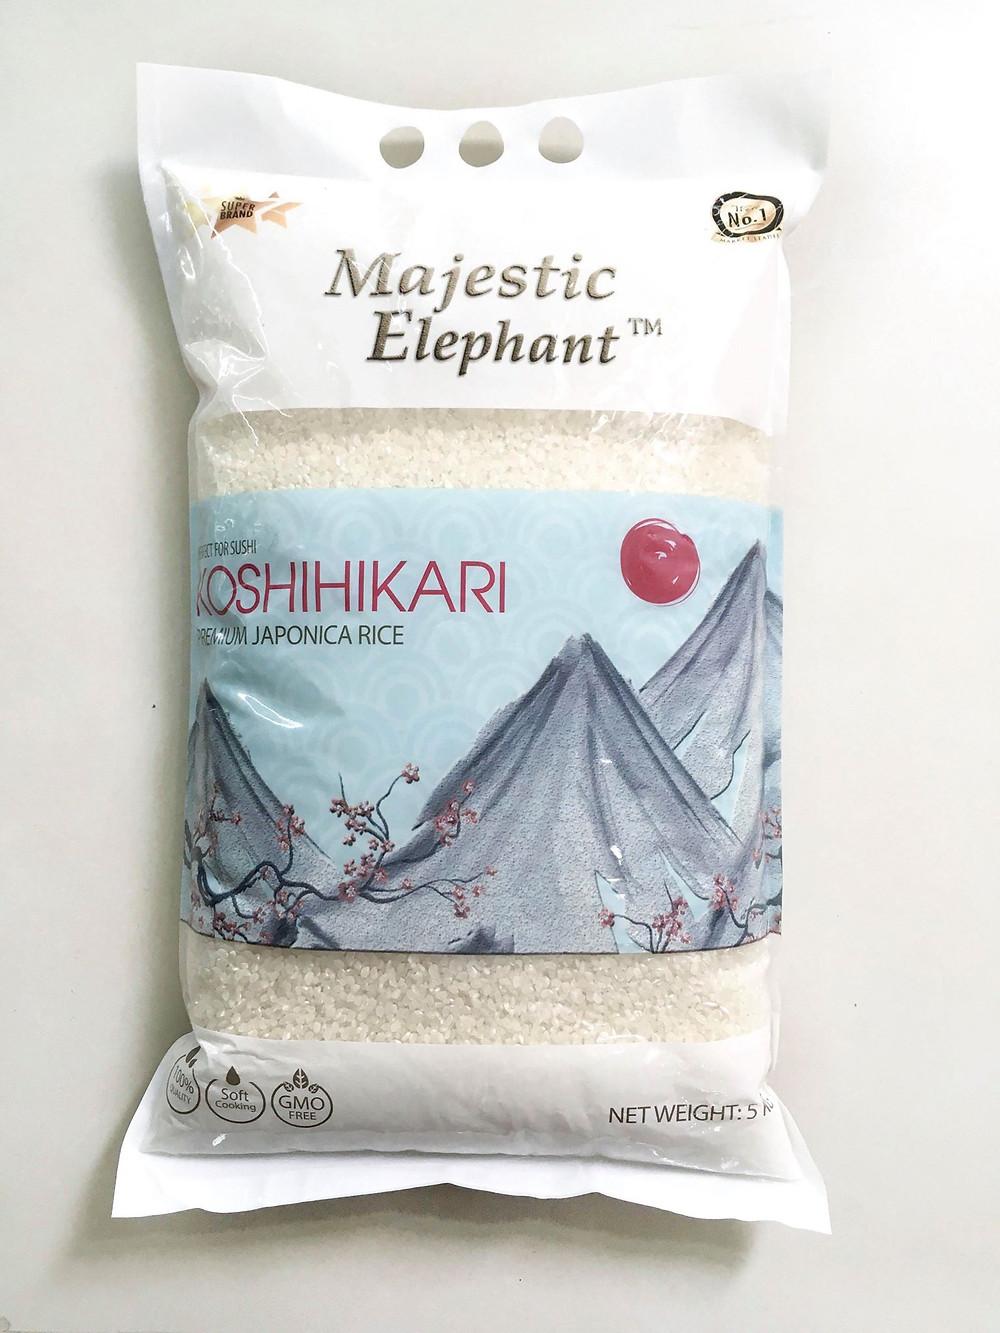 Packing 5kg Majestic Elephant Premium Japonica rice Koshihikari